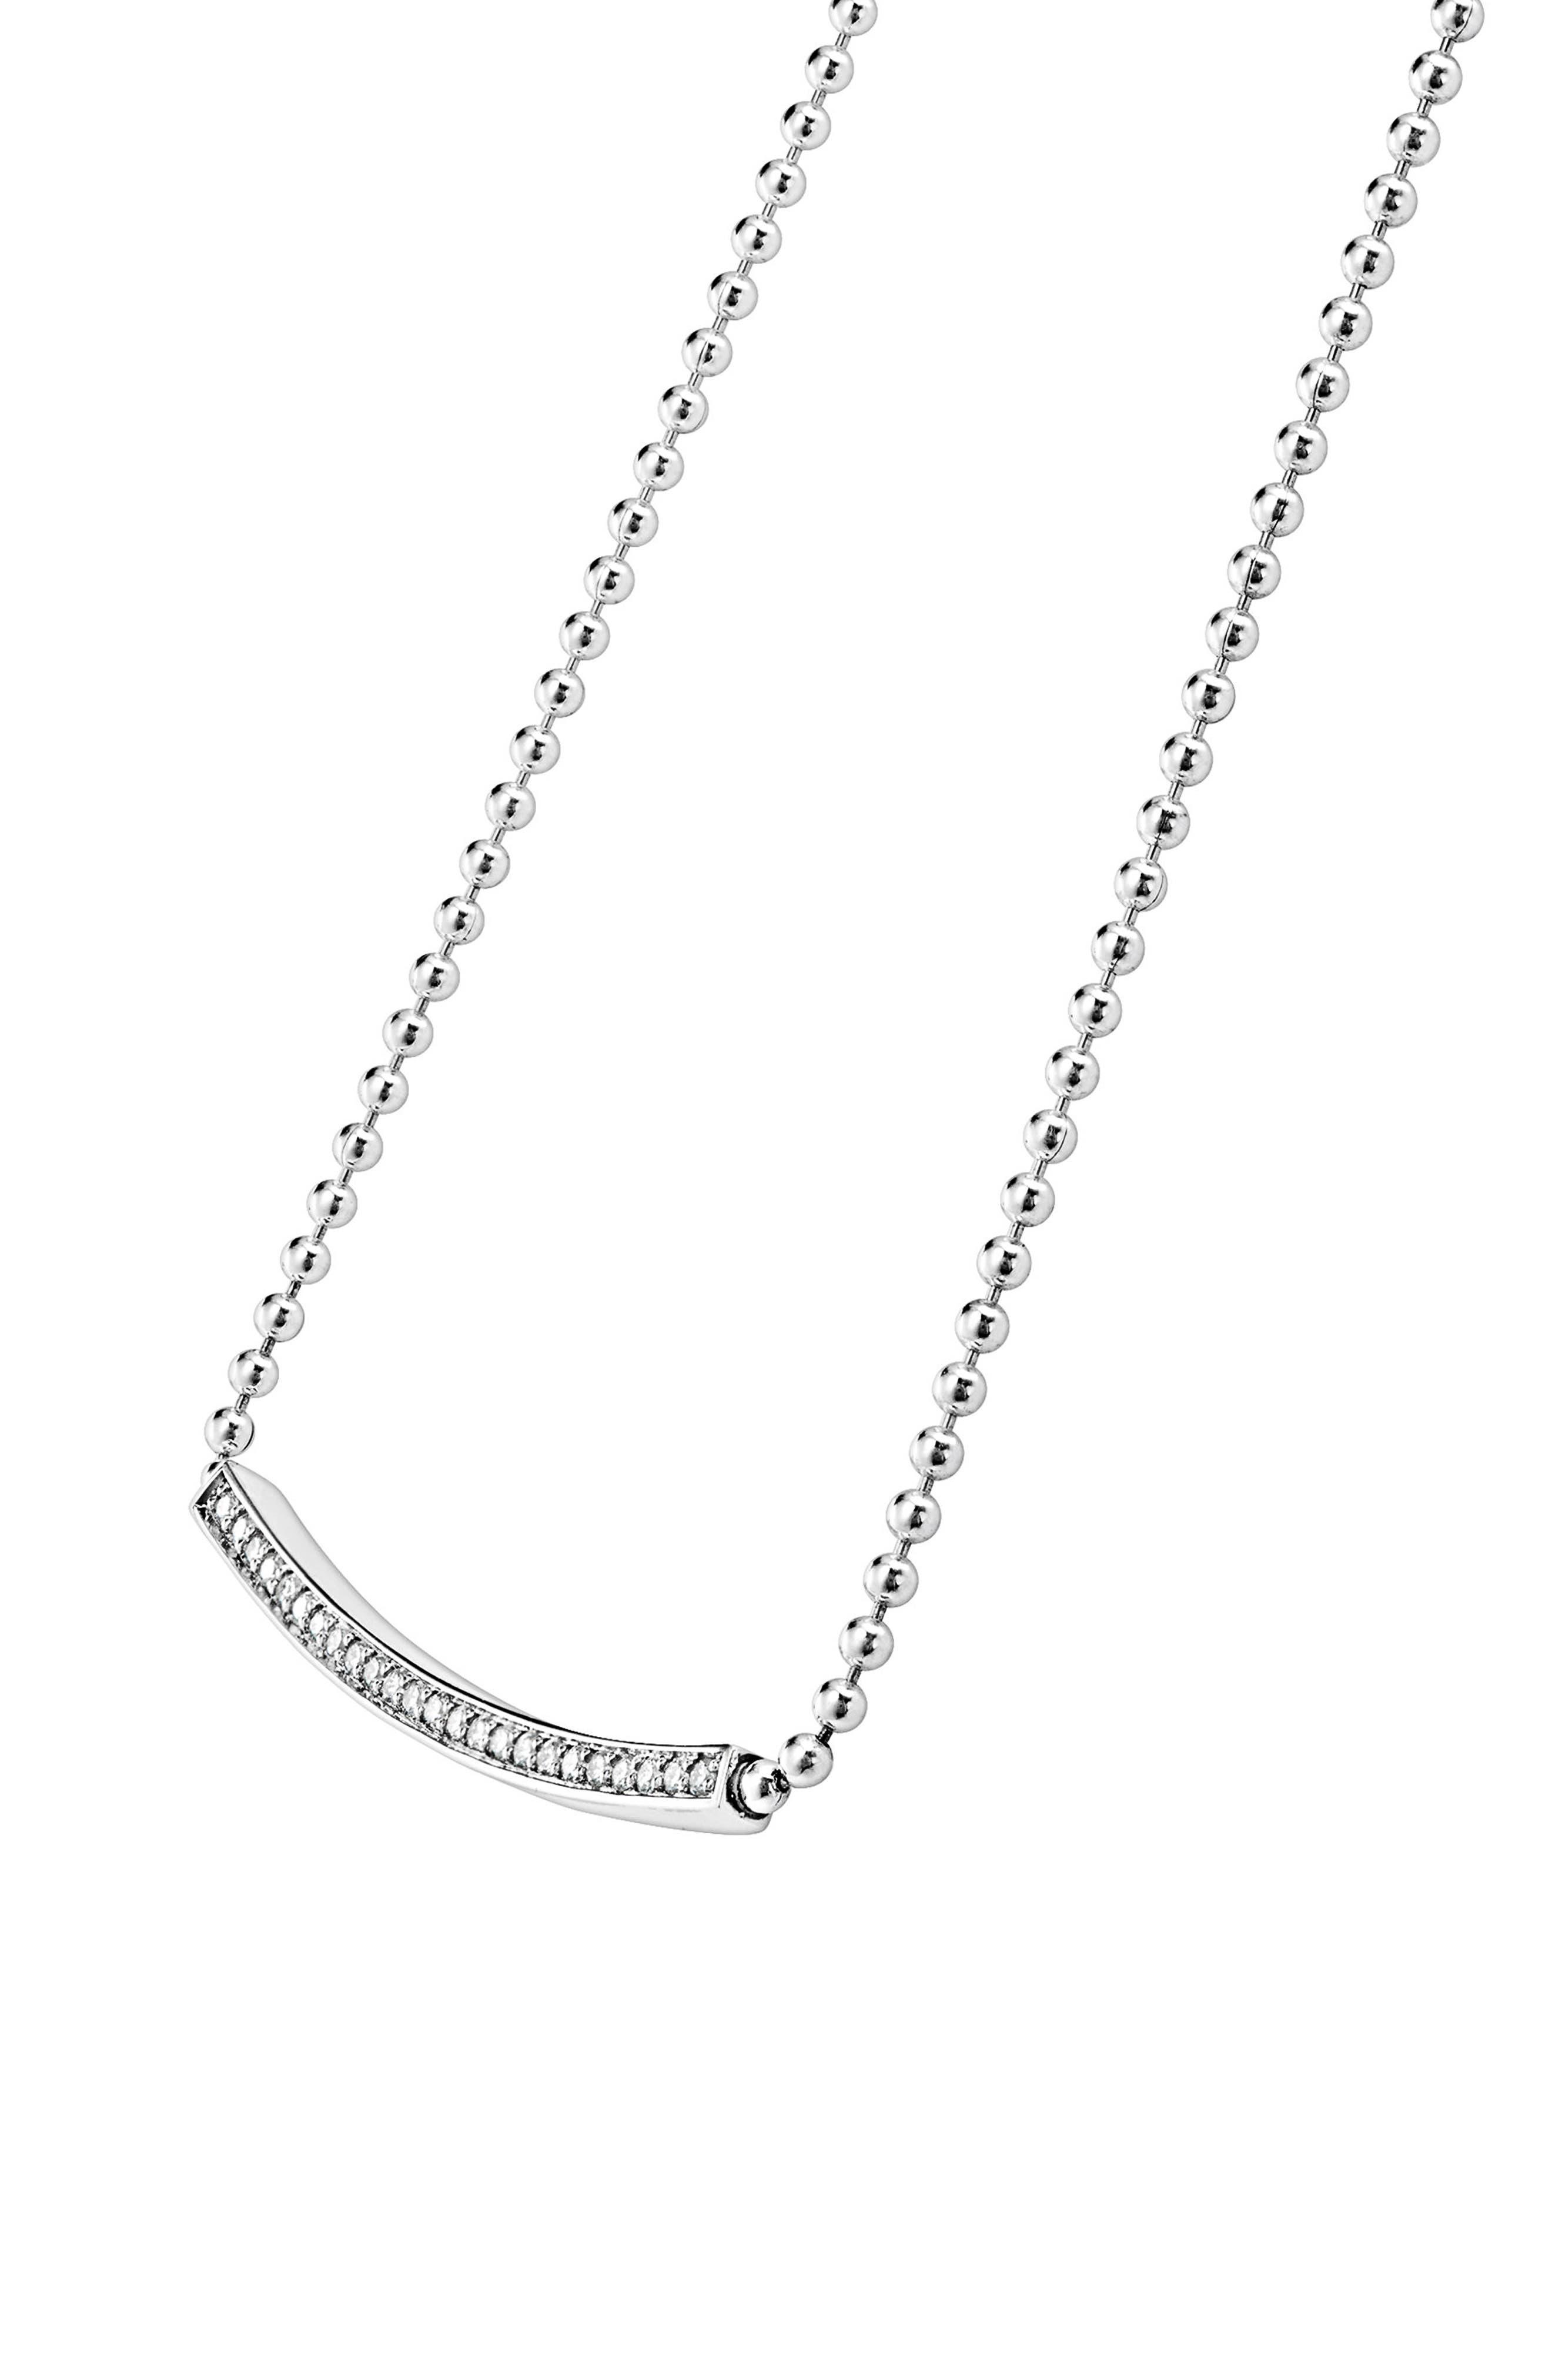 Caviar Spark Diamond Bar Necklace,                             Alternate thumbnail 5, color,                             SILVER/ DIAMOND